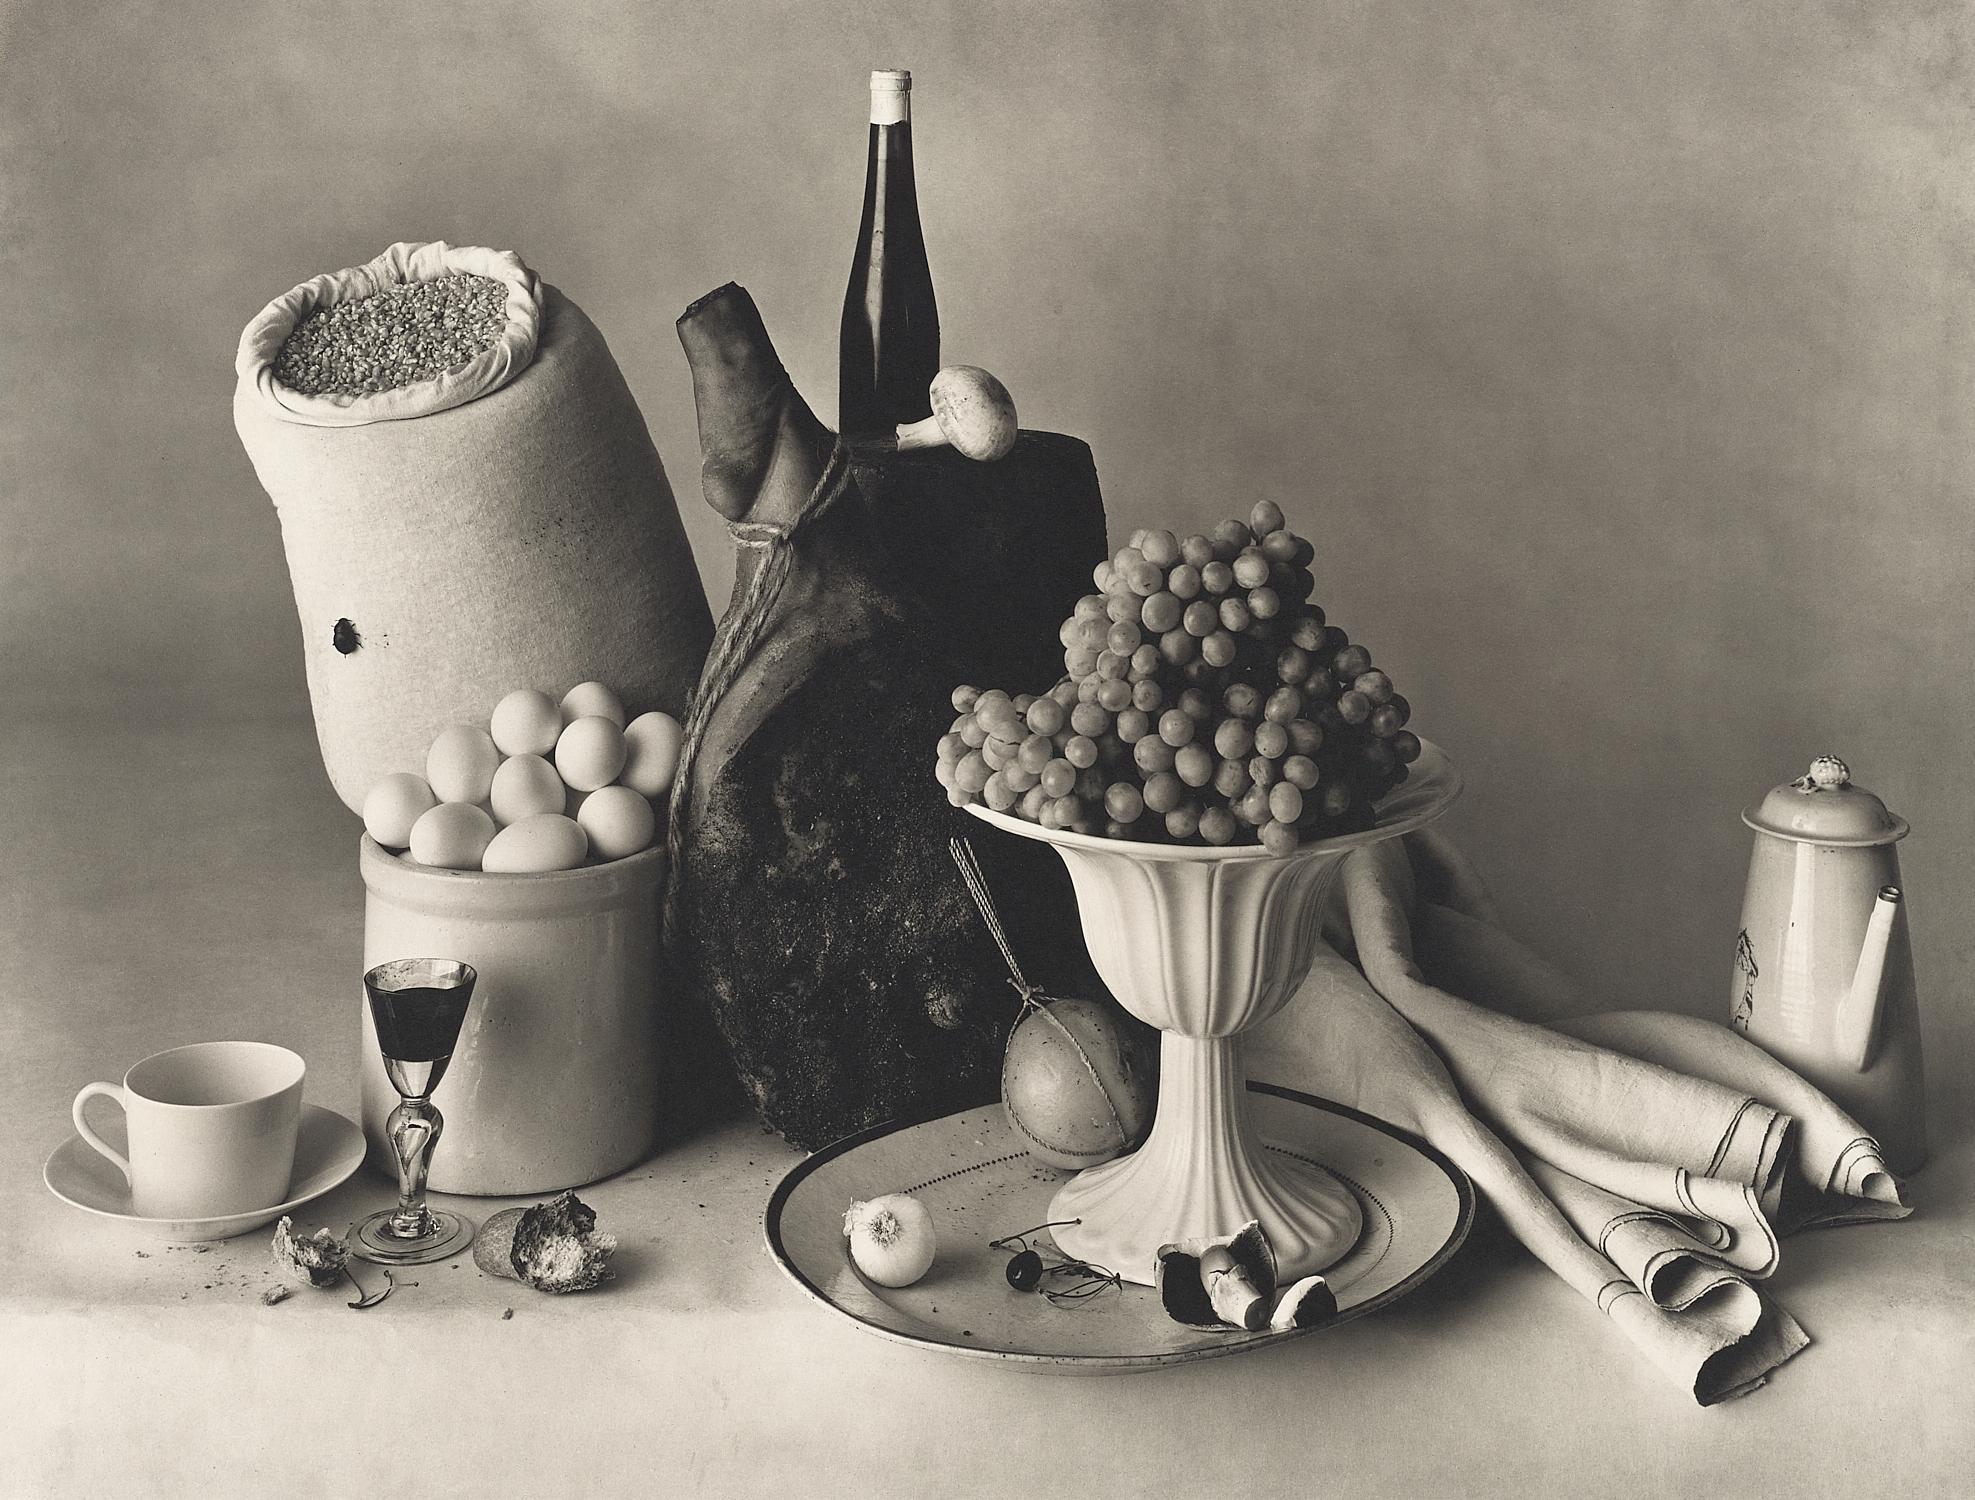 Irving Penn, New York Still Life , 1947. Platinum-palladium print. © Condé Nast